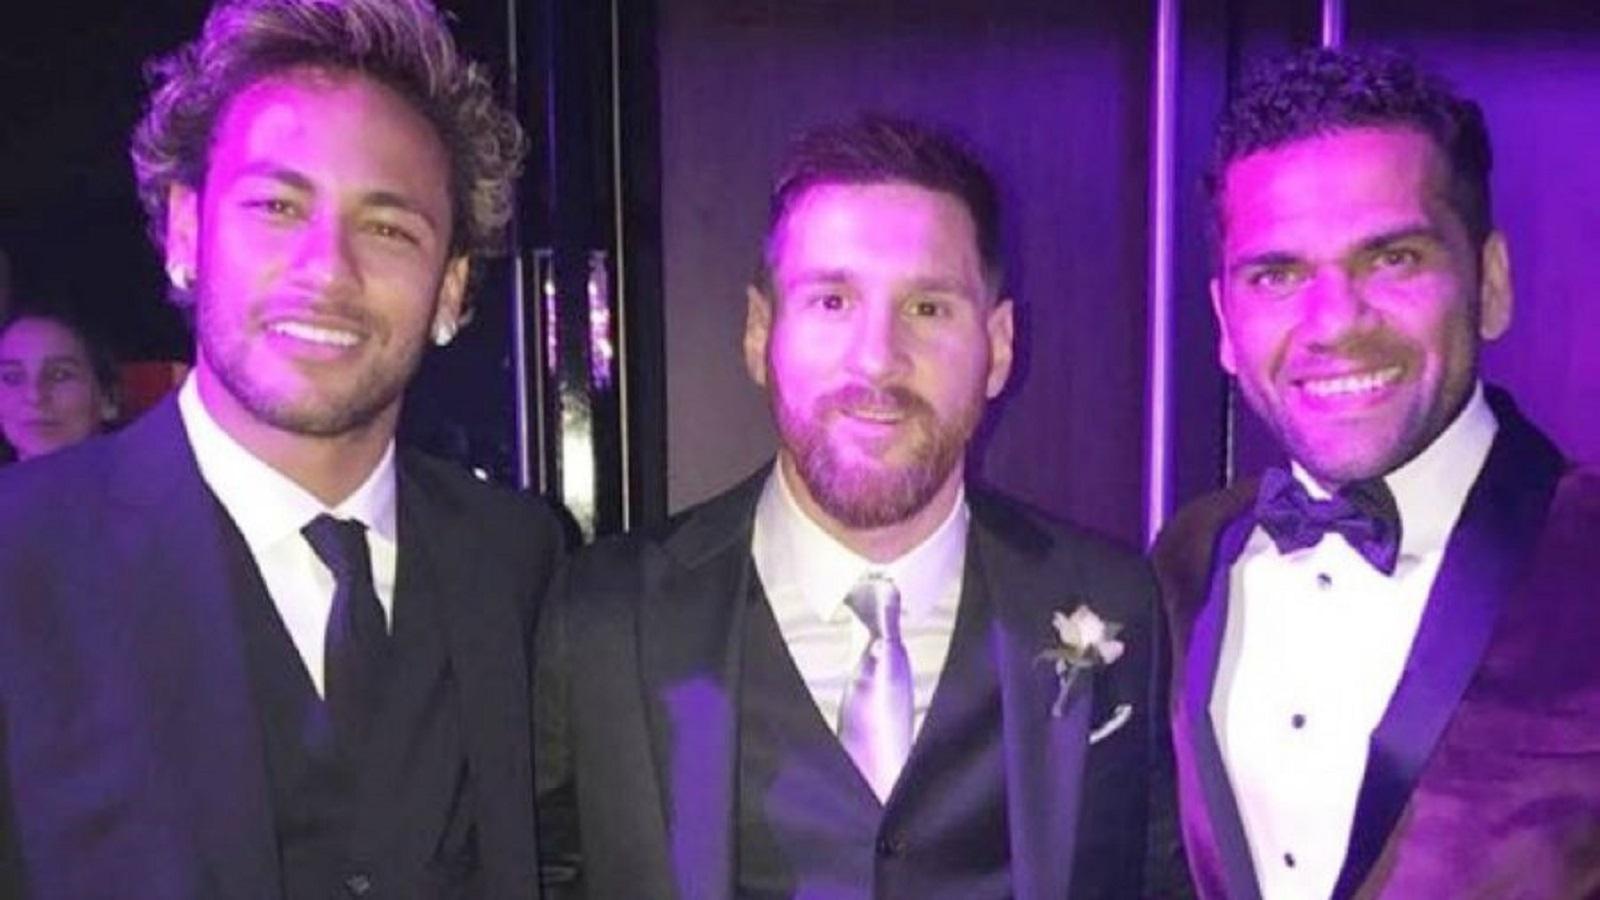 VIDEO: ¡El mensaje de Neymar a Messi en Instagram!